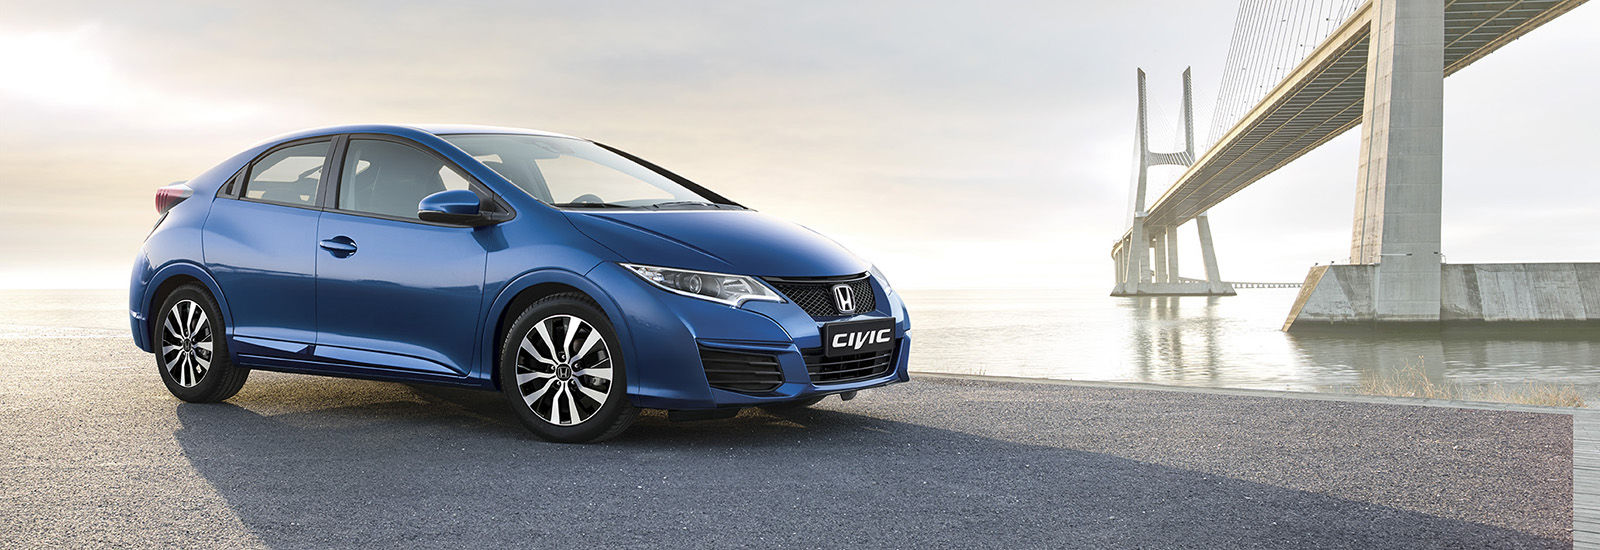 Honda Civic Limited Edition  CRV Black Edition  carwow